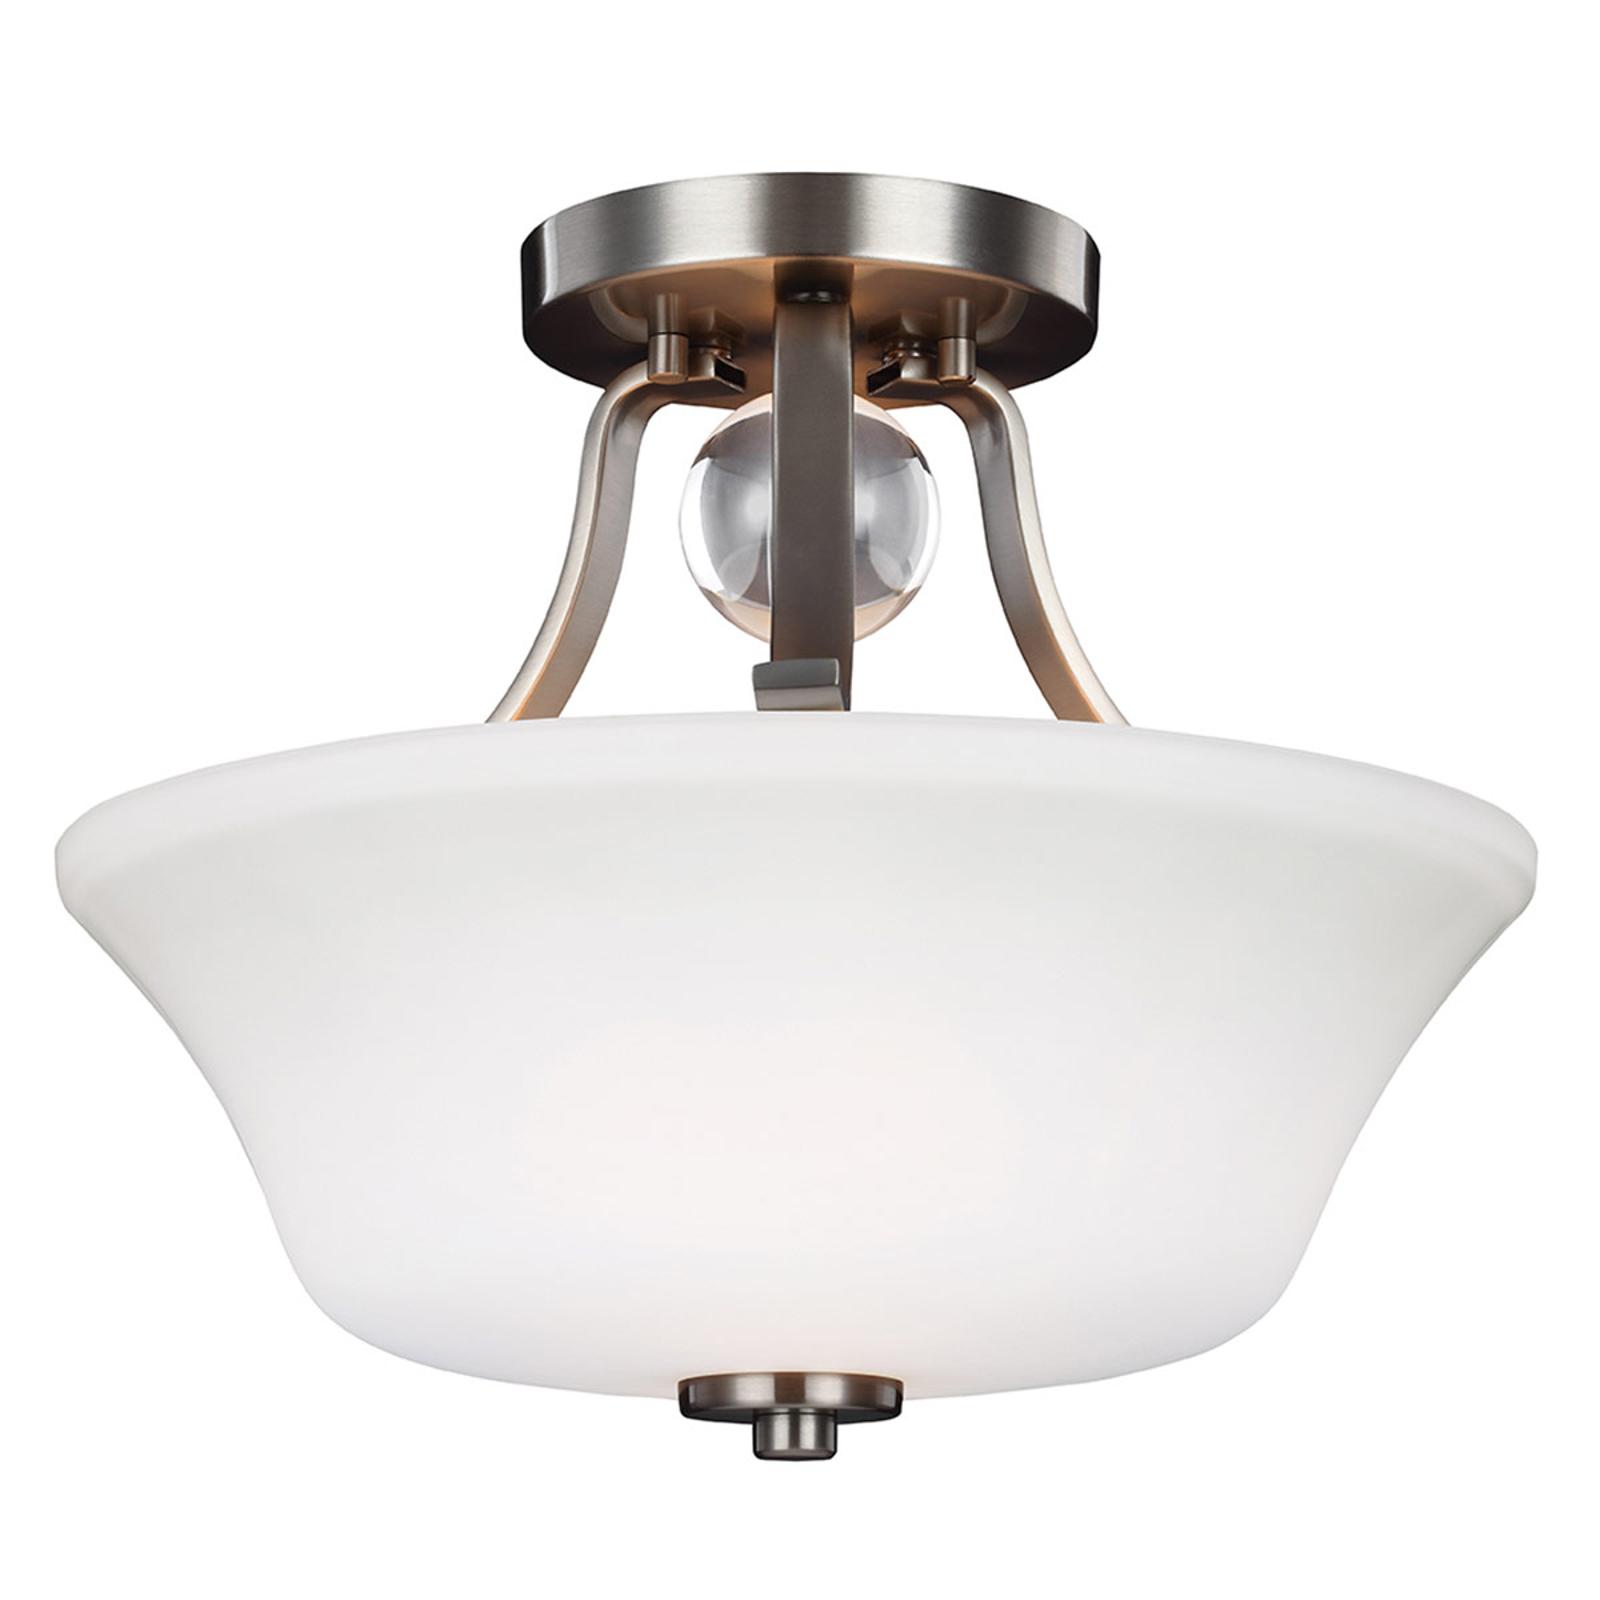 Lampa sufitowa Evington, nikiel